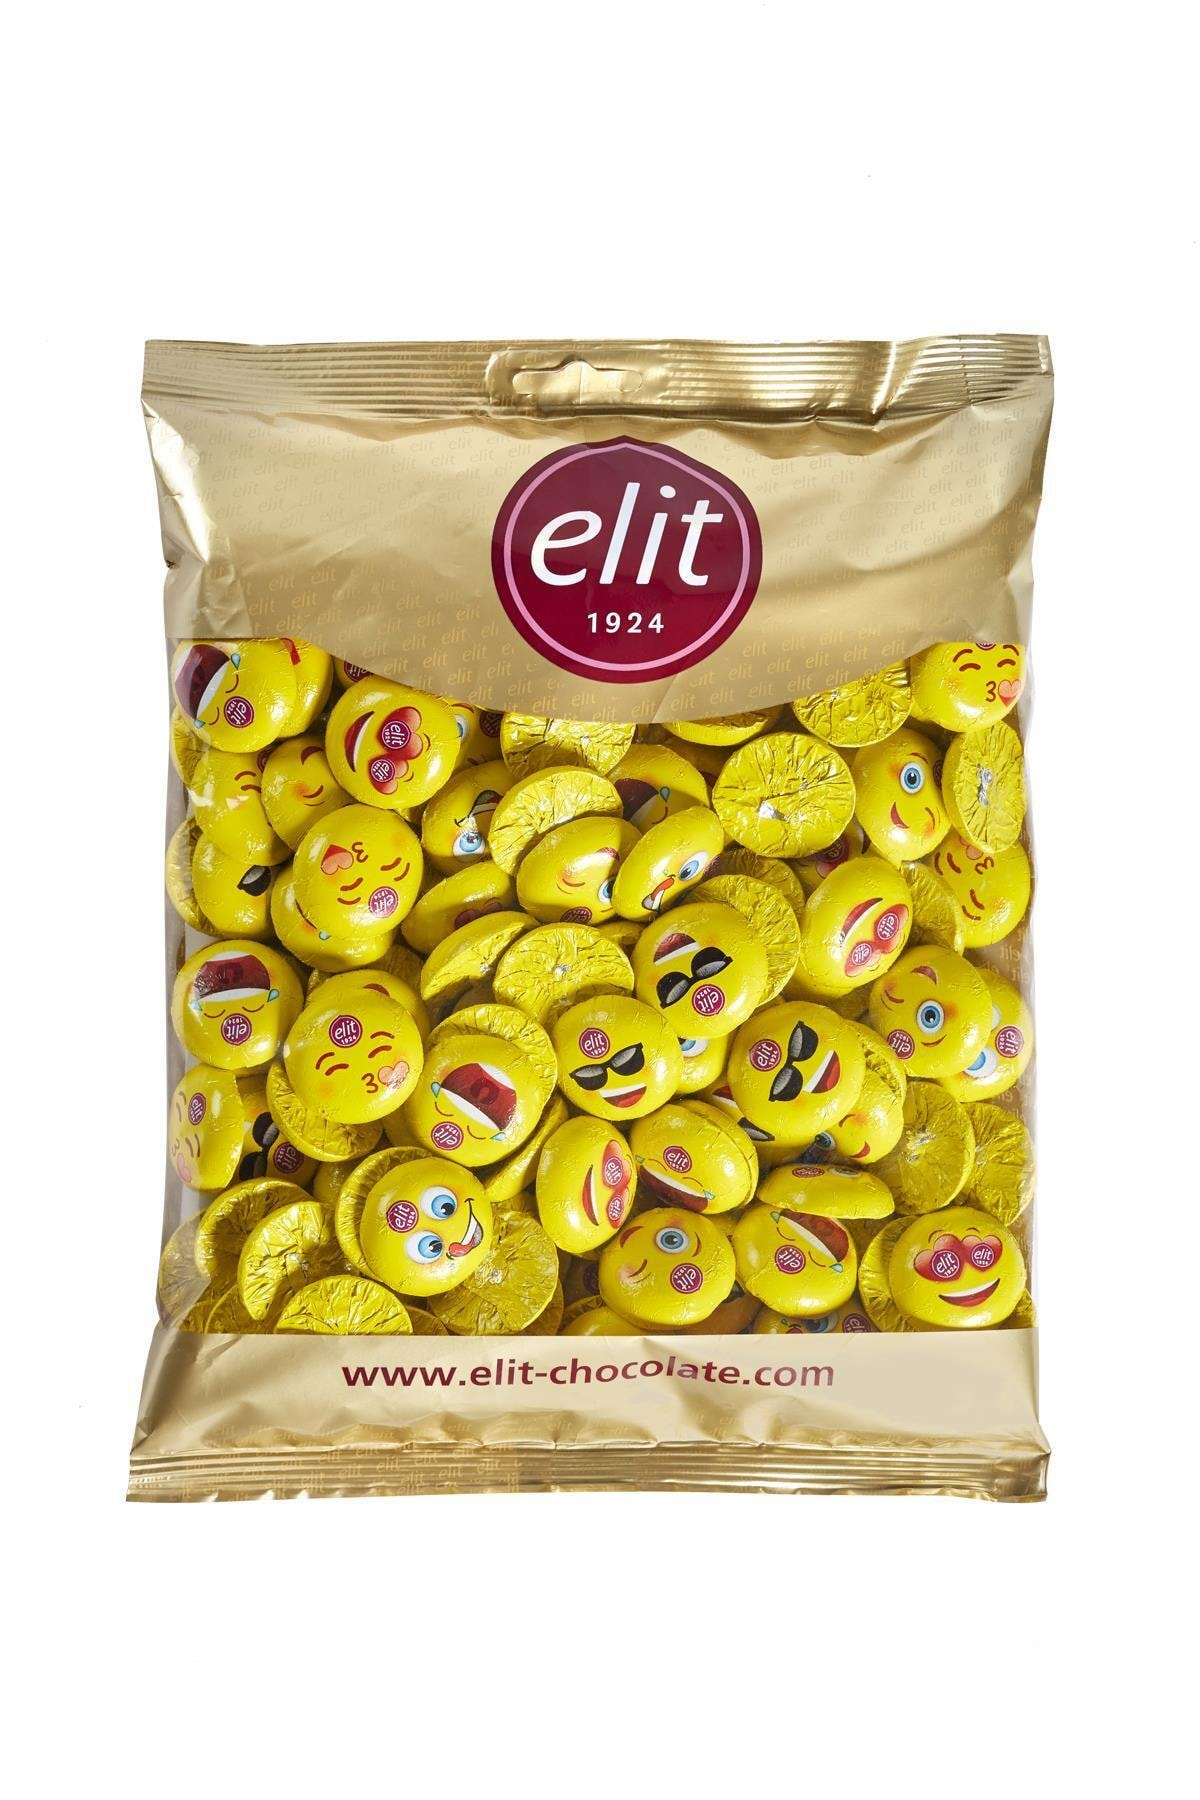 Elit Çikolata Mini Elitoloji Emoji Çikolata 1 Kg Glutensiz 1